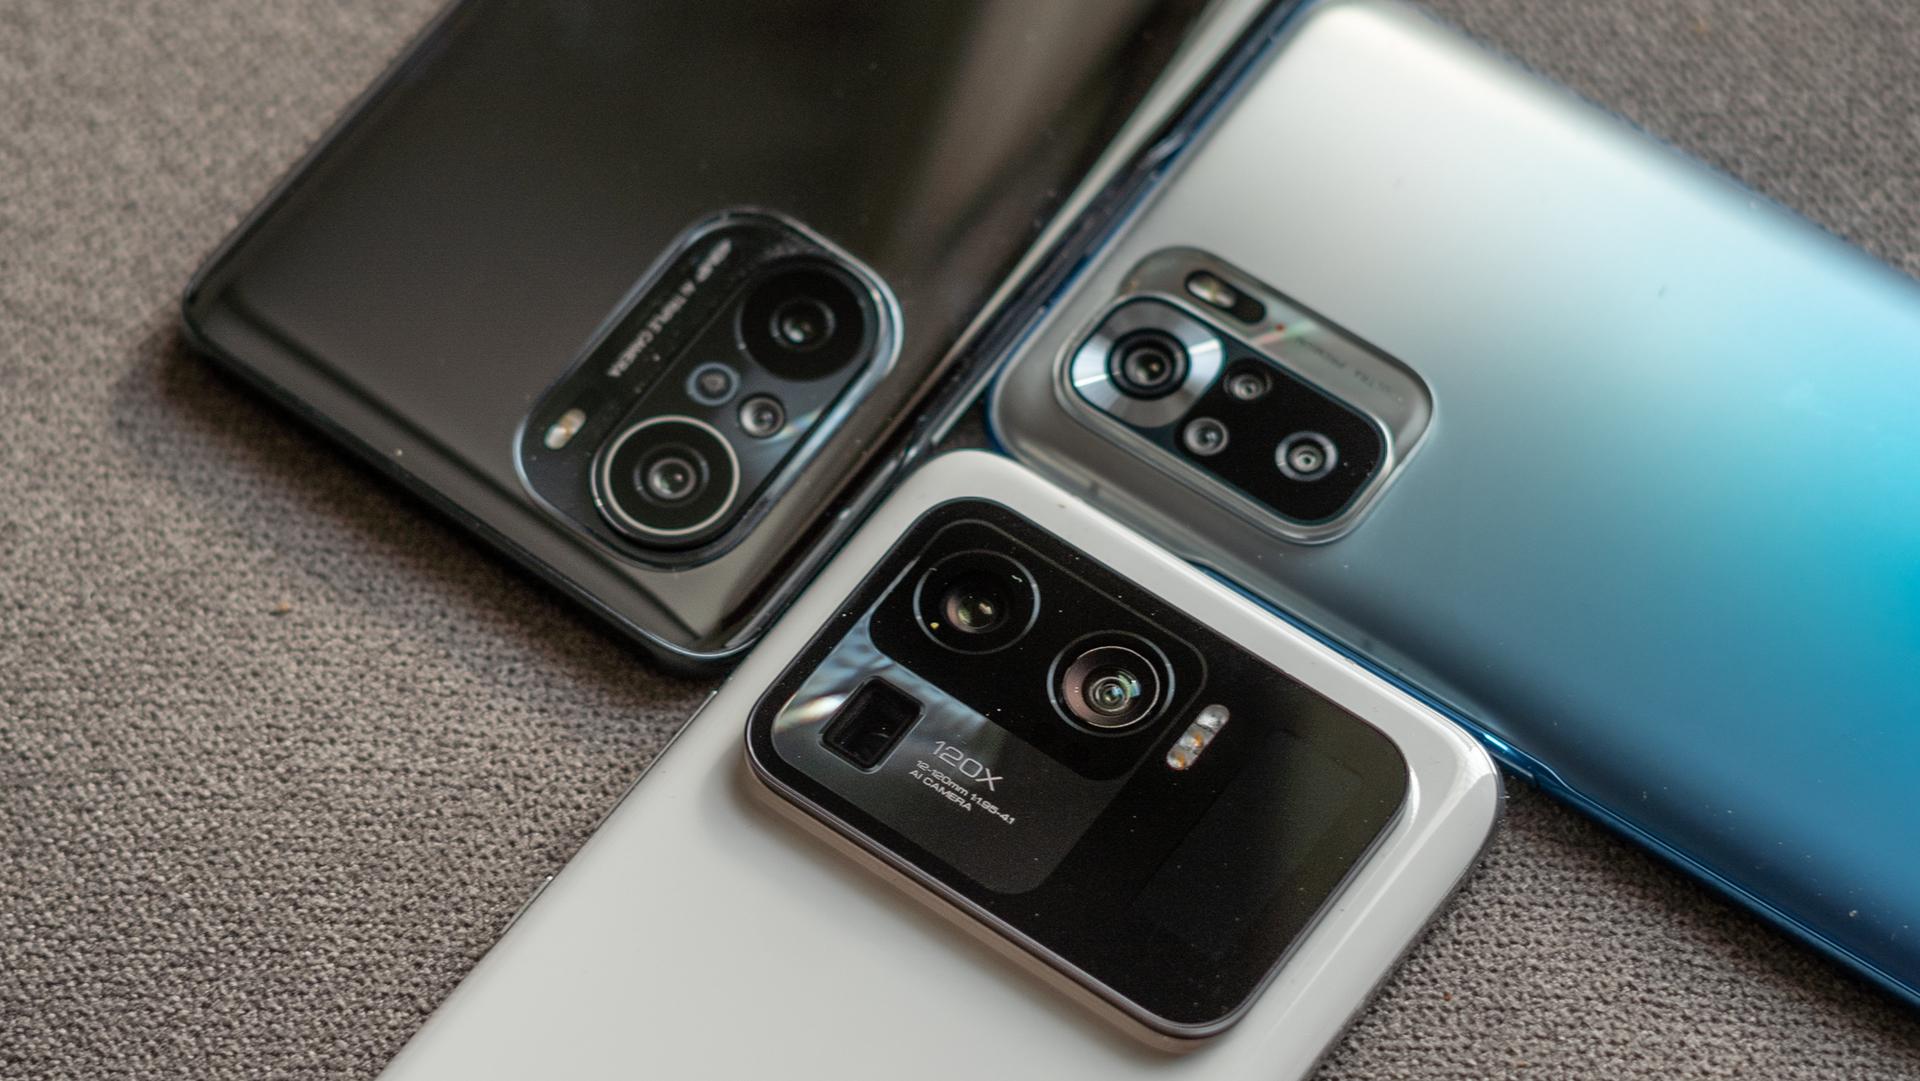 Xiaomi 2021 India close up on cameras